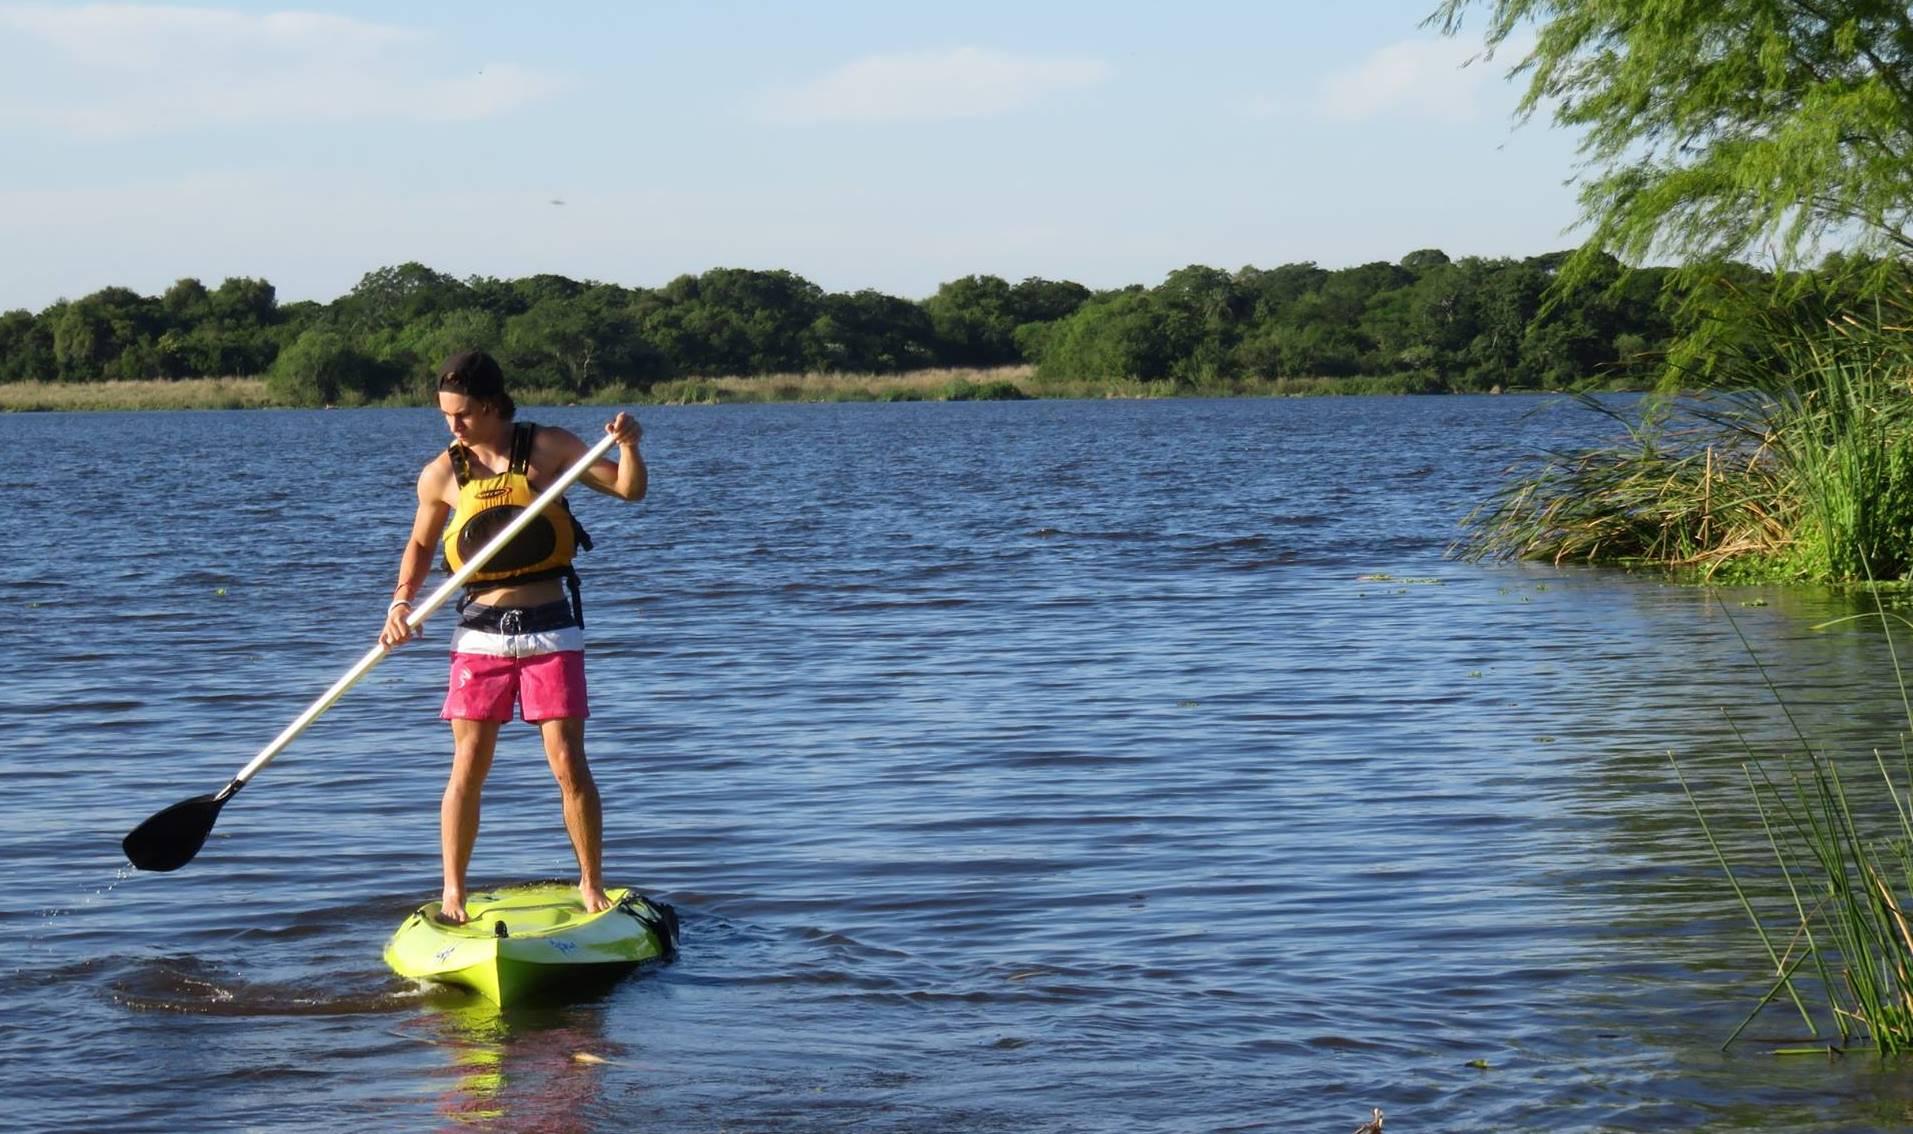 Carayá - StandUp Paddle (SUP)